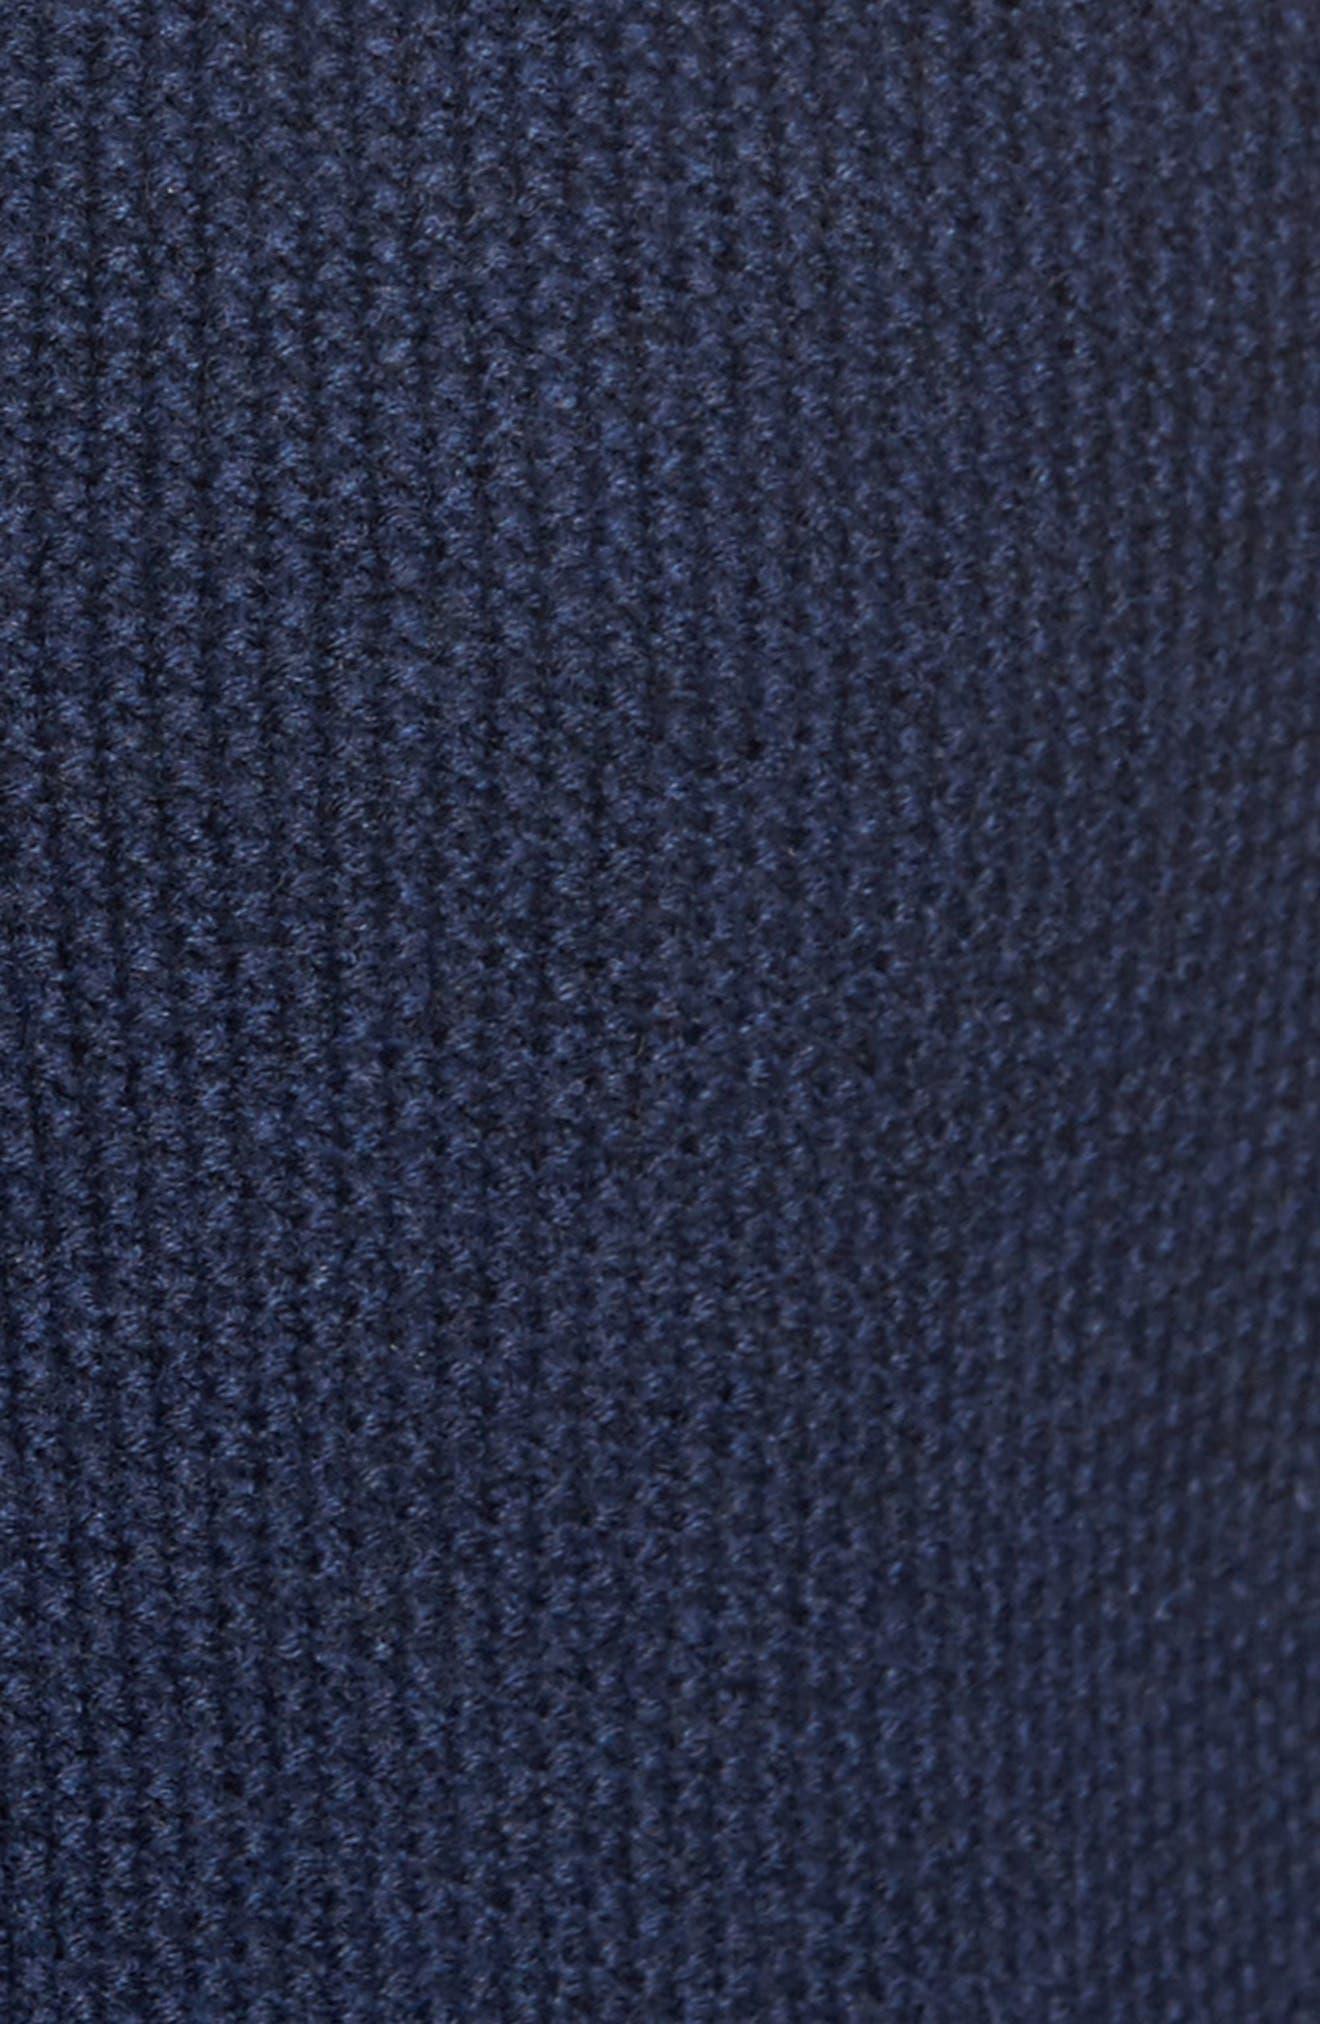 Haydon Merino Wool Sweater Jacket,                             Alternate thumbnail 5, color,                             410